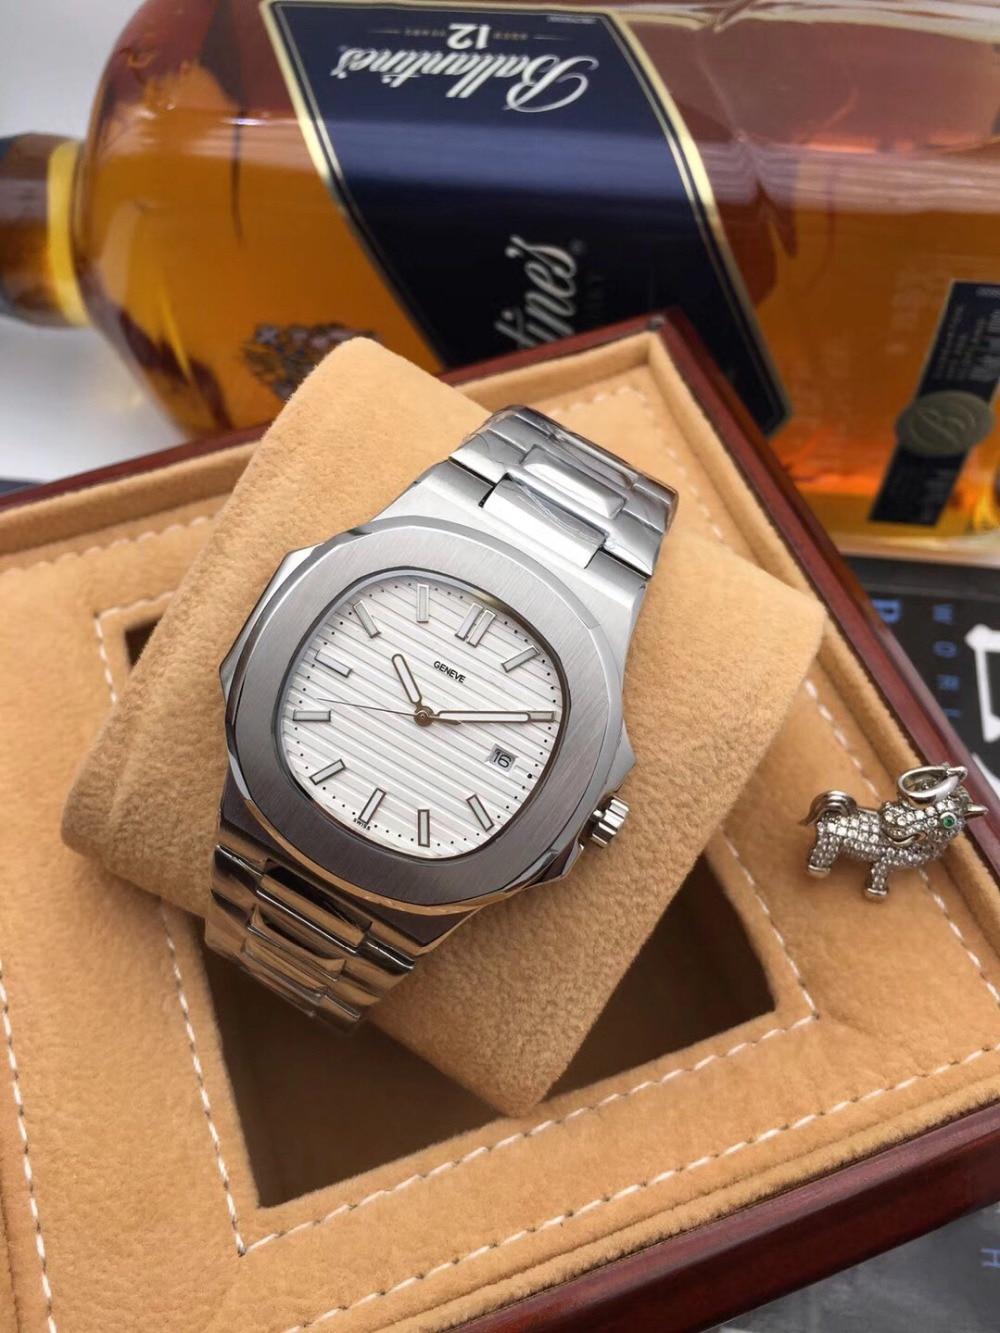 11Classic Men Watches Brand Luxury Full Stainless steel Mechanical Watch Fashion Male Clocks Elegant Unisex Sport Watch часы наручные mitya veselkov инь и ян mvblack 16